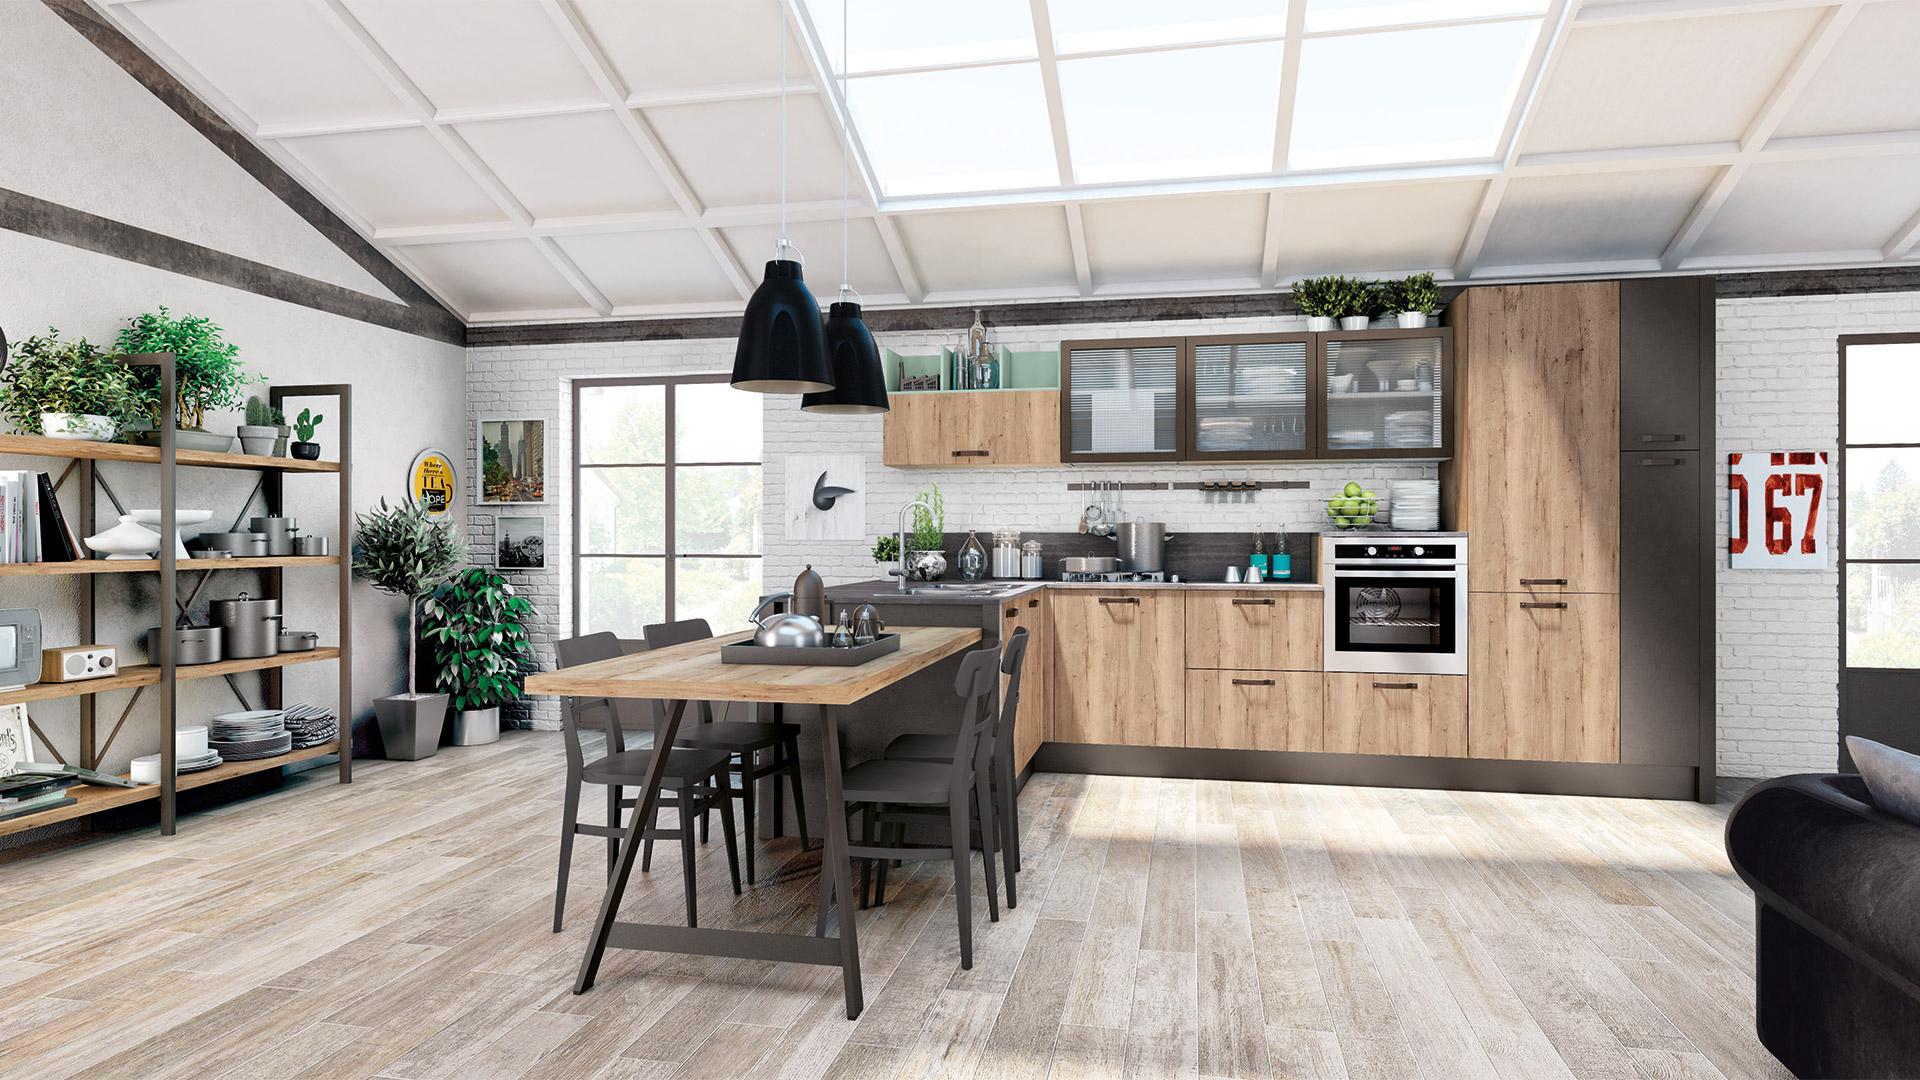 Cucina kyra cucine moderne creo kitchens